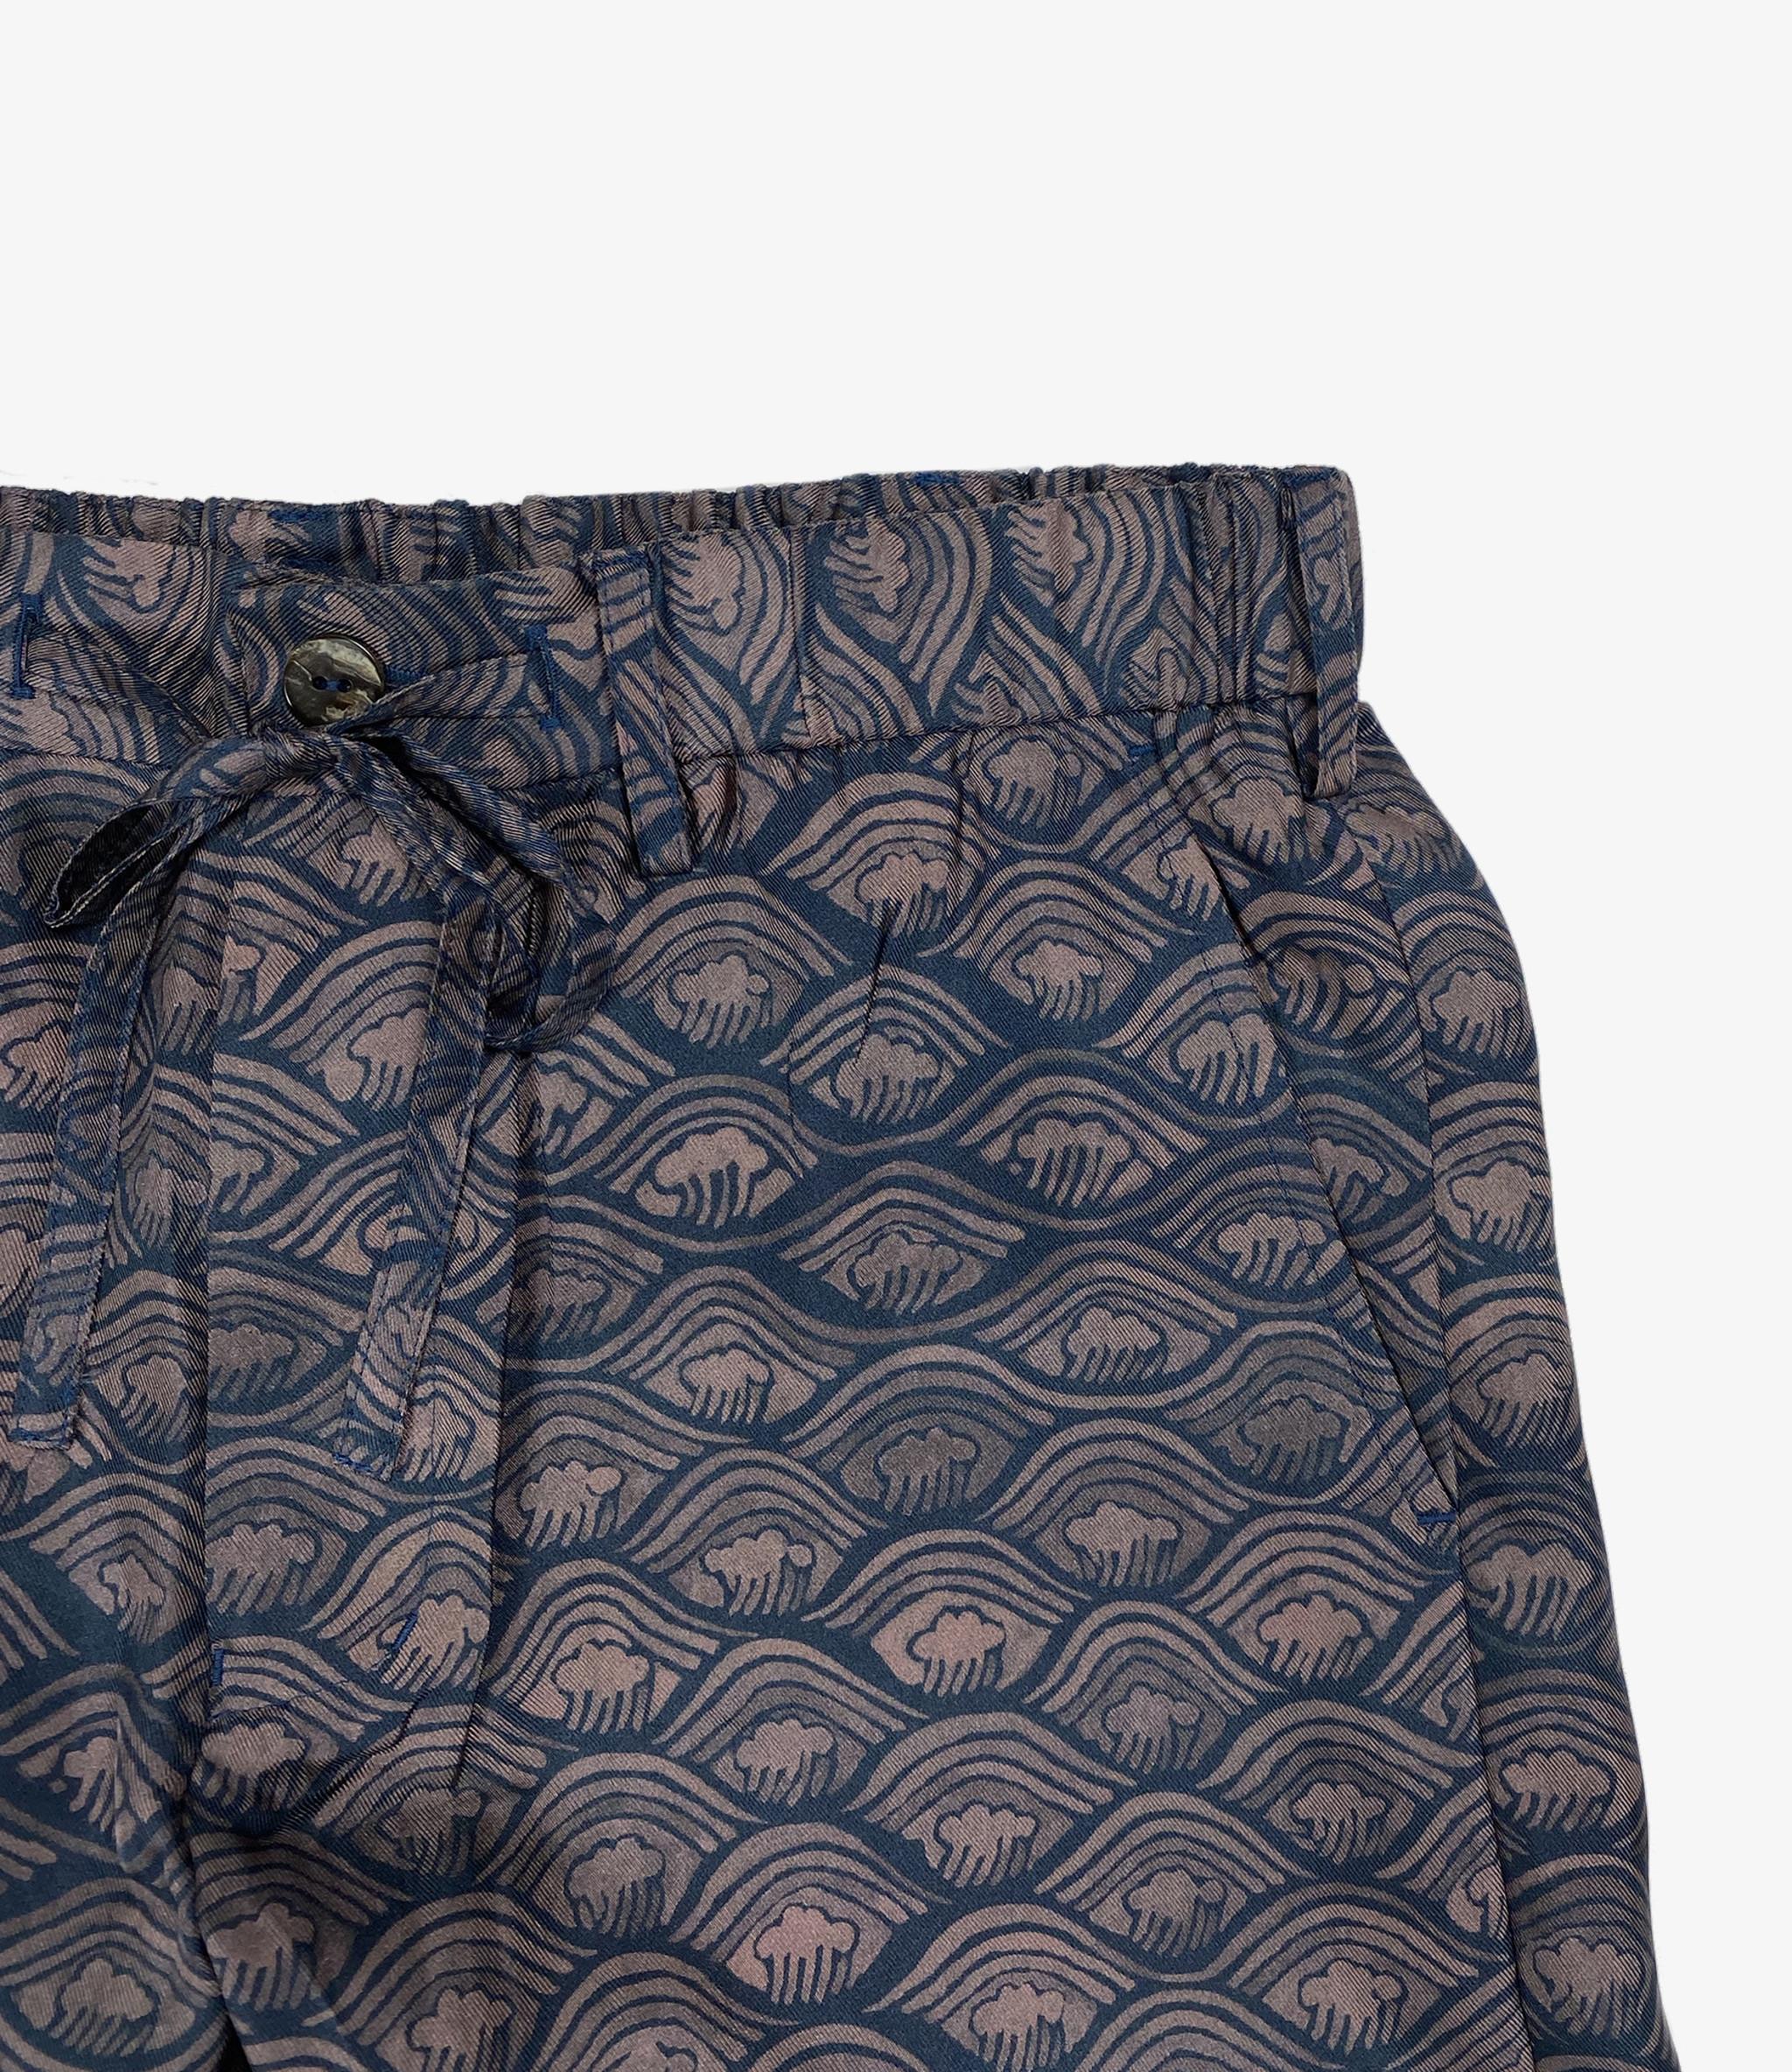 Wang Chomphu Silk String Short / Kang Keag Sant - Siam Wave Pattern